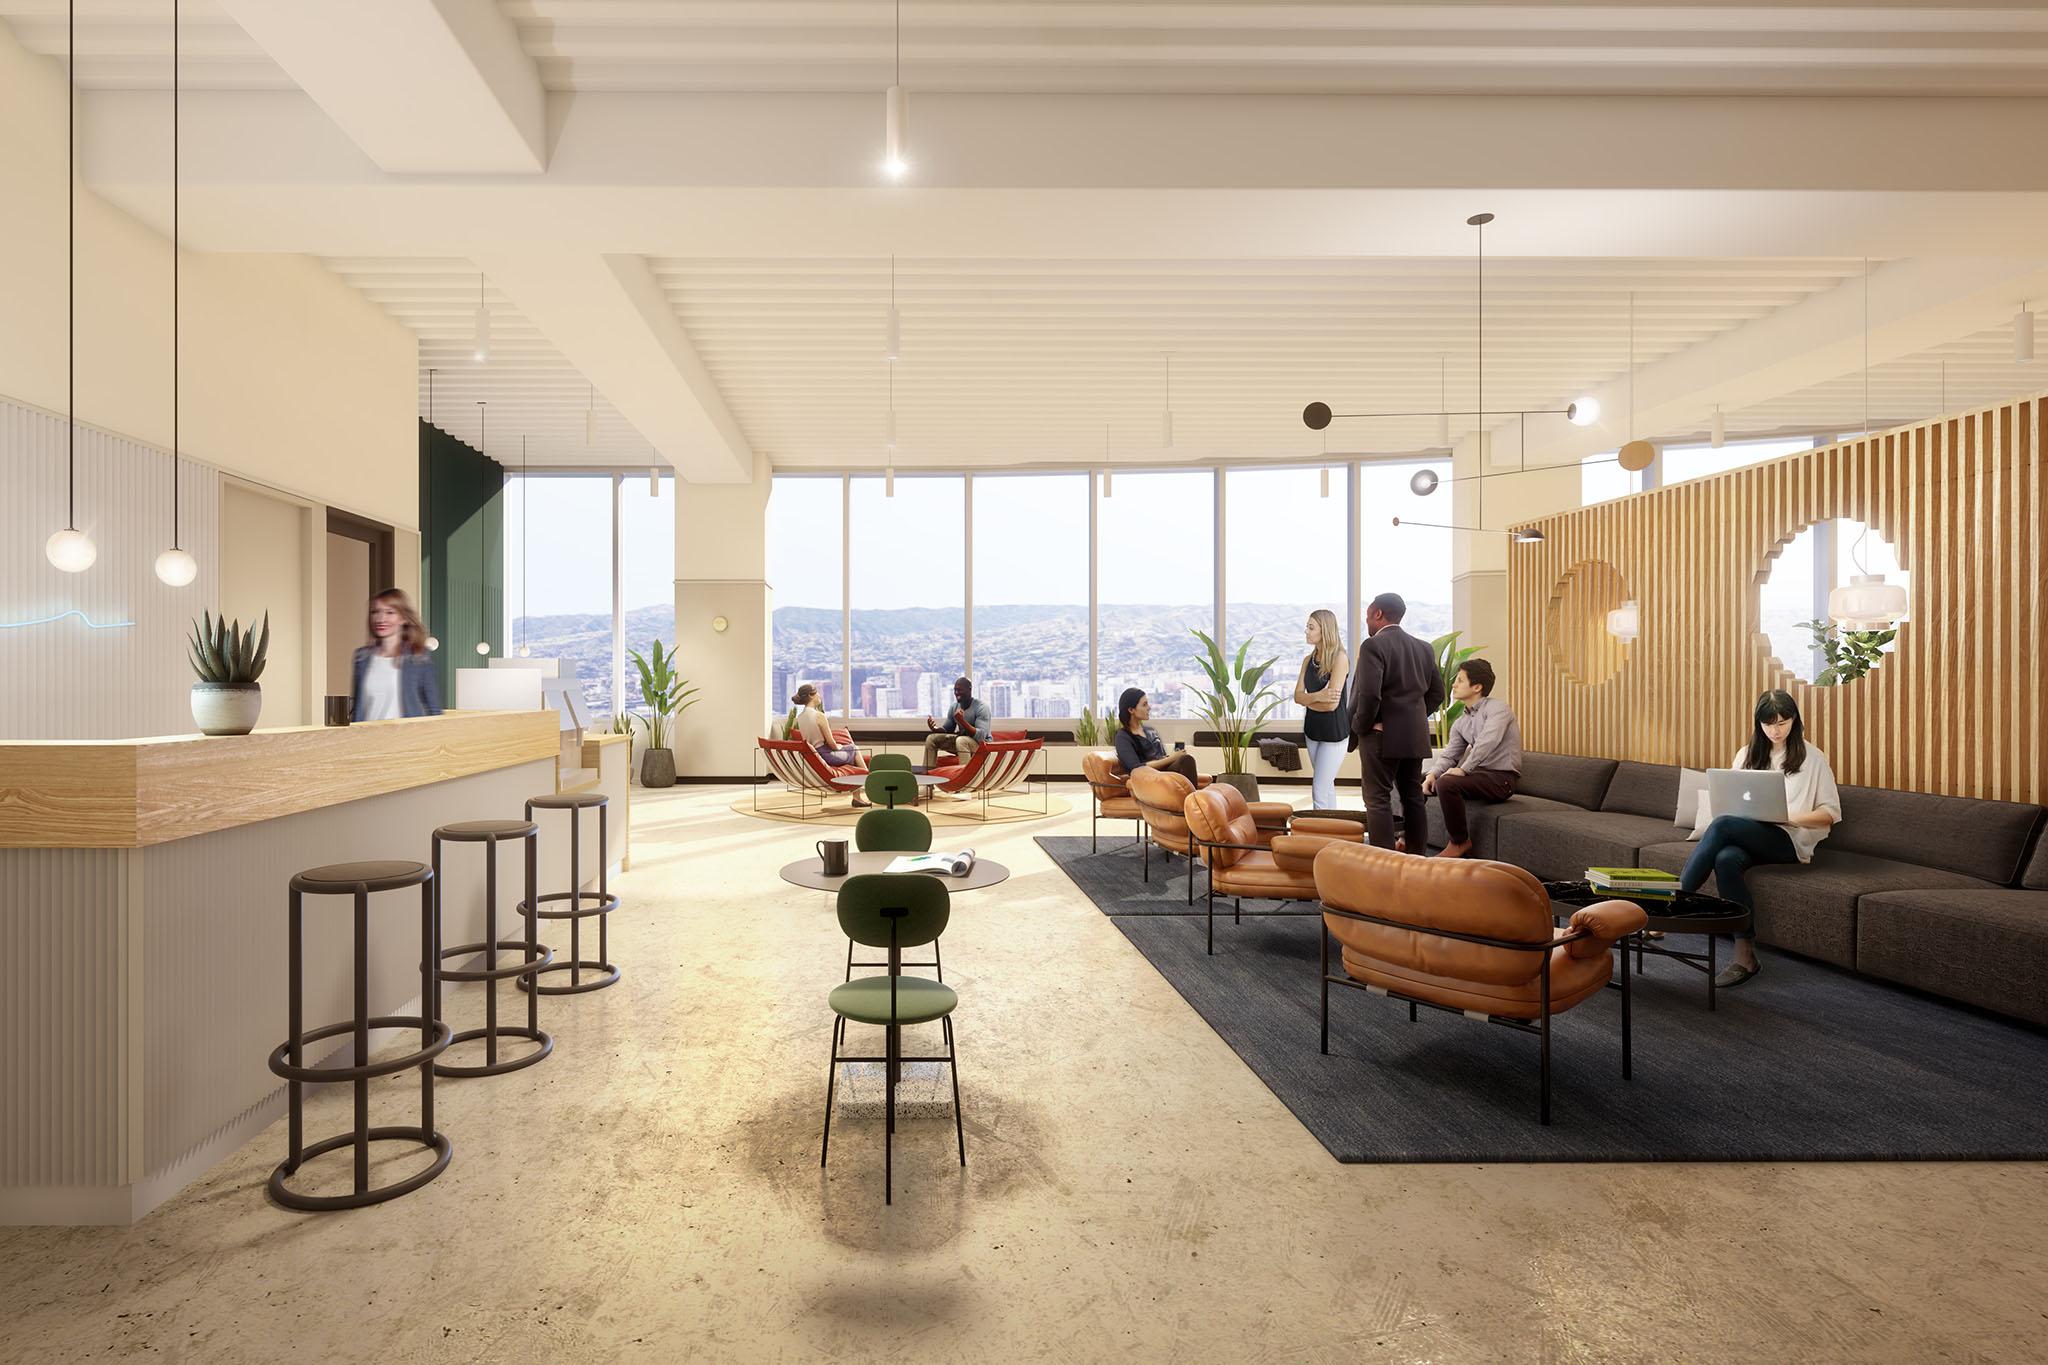 Renderings for Real Estate New York